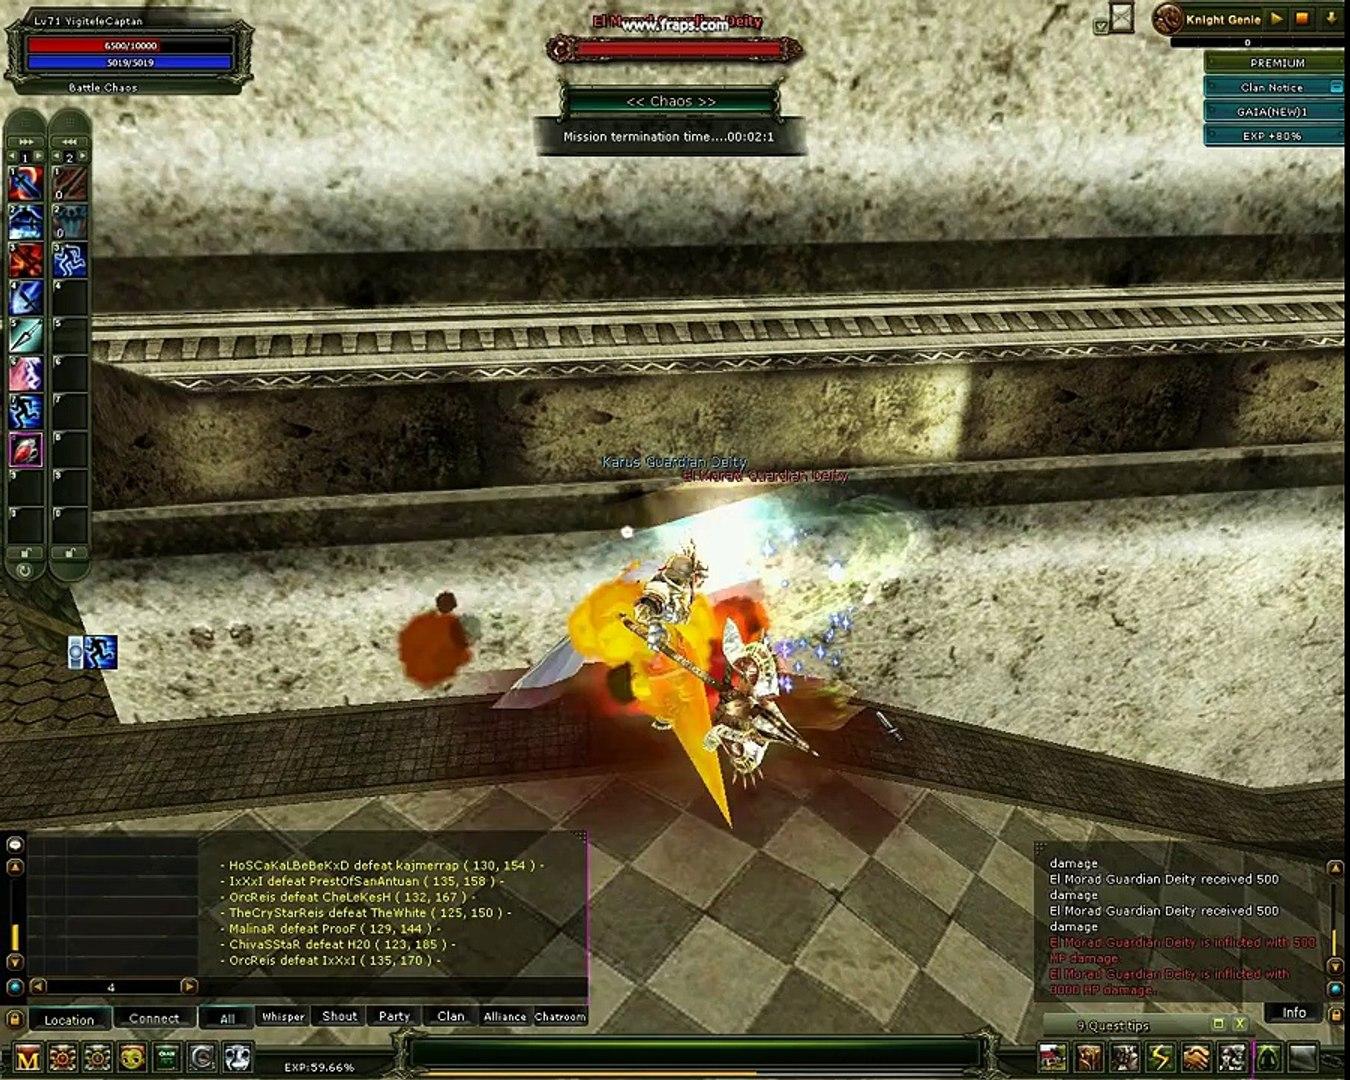 KnightOnLine Gaia Server Chaos 2014 01 04 11 28 45 06 Xvid